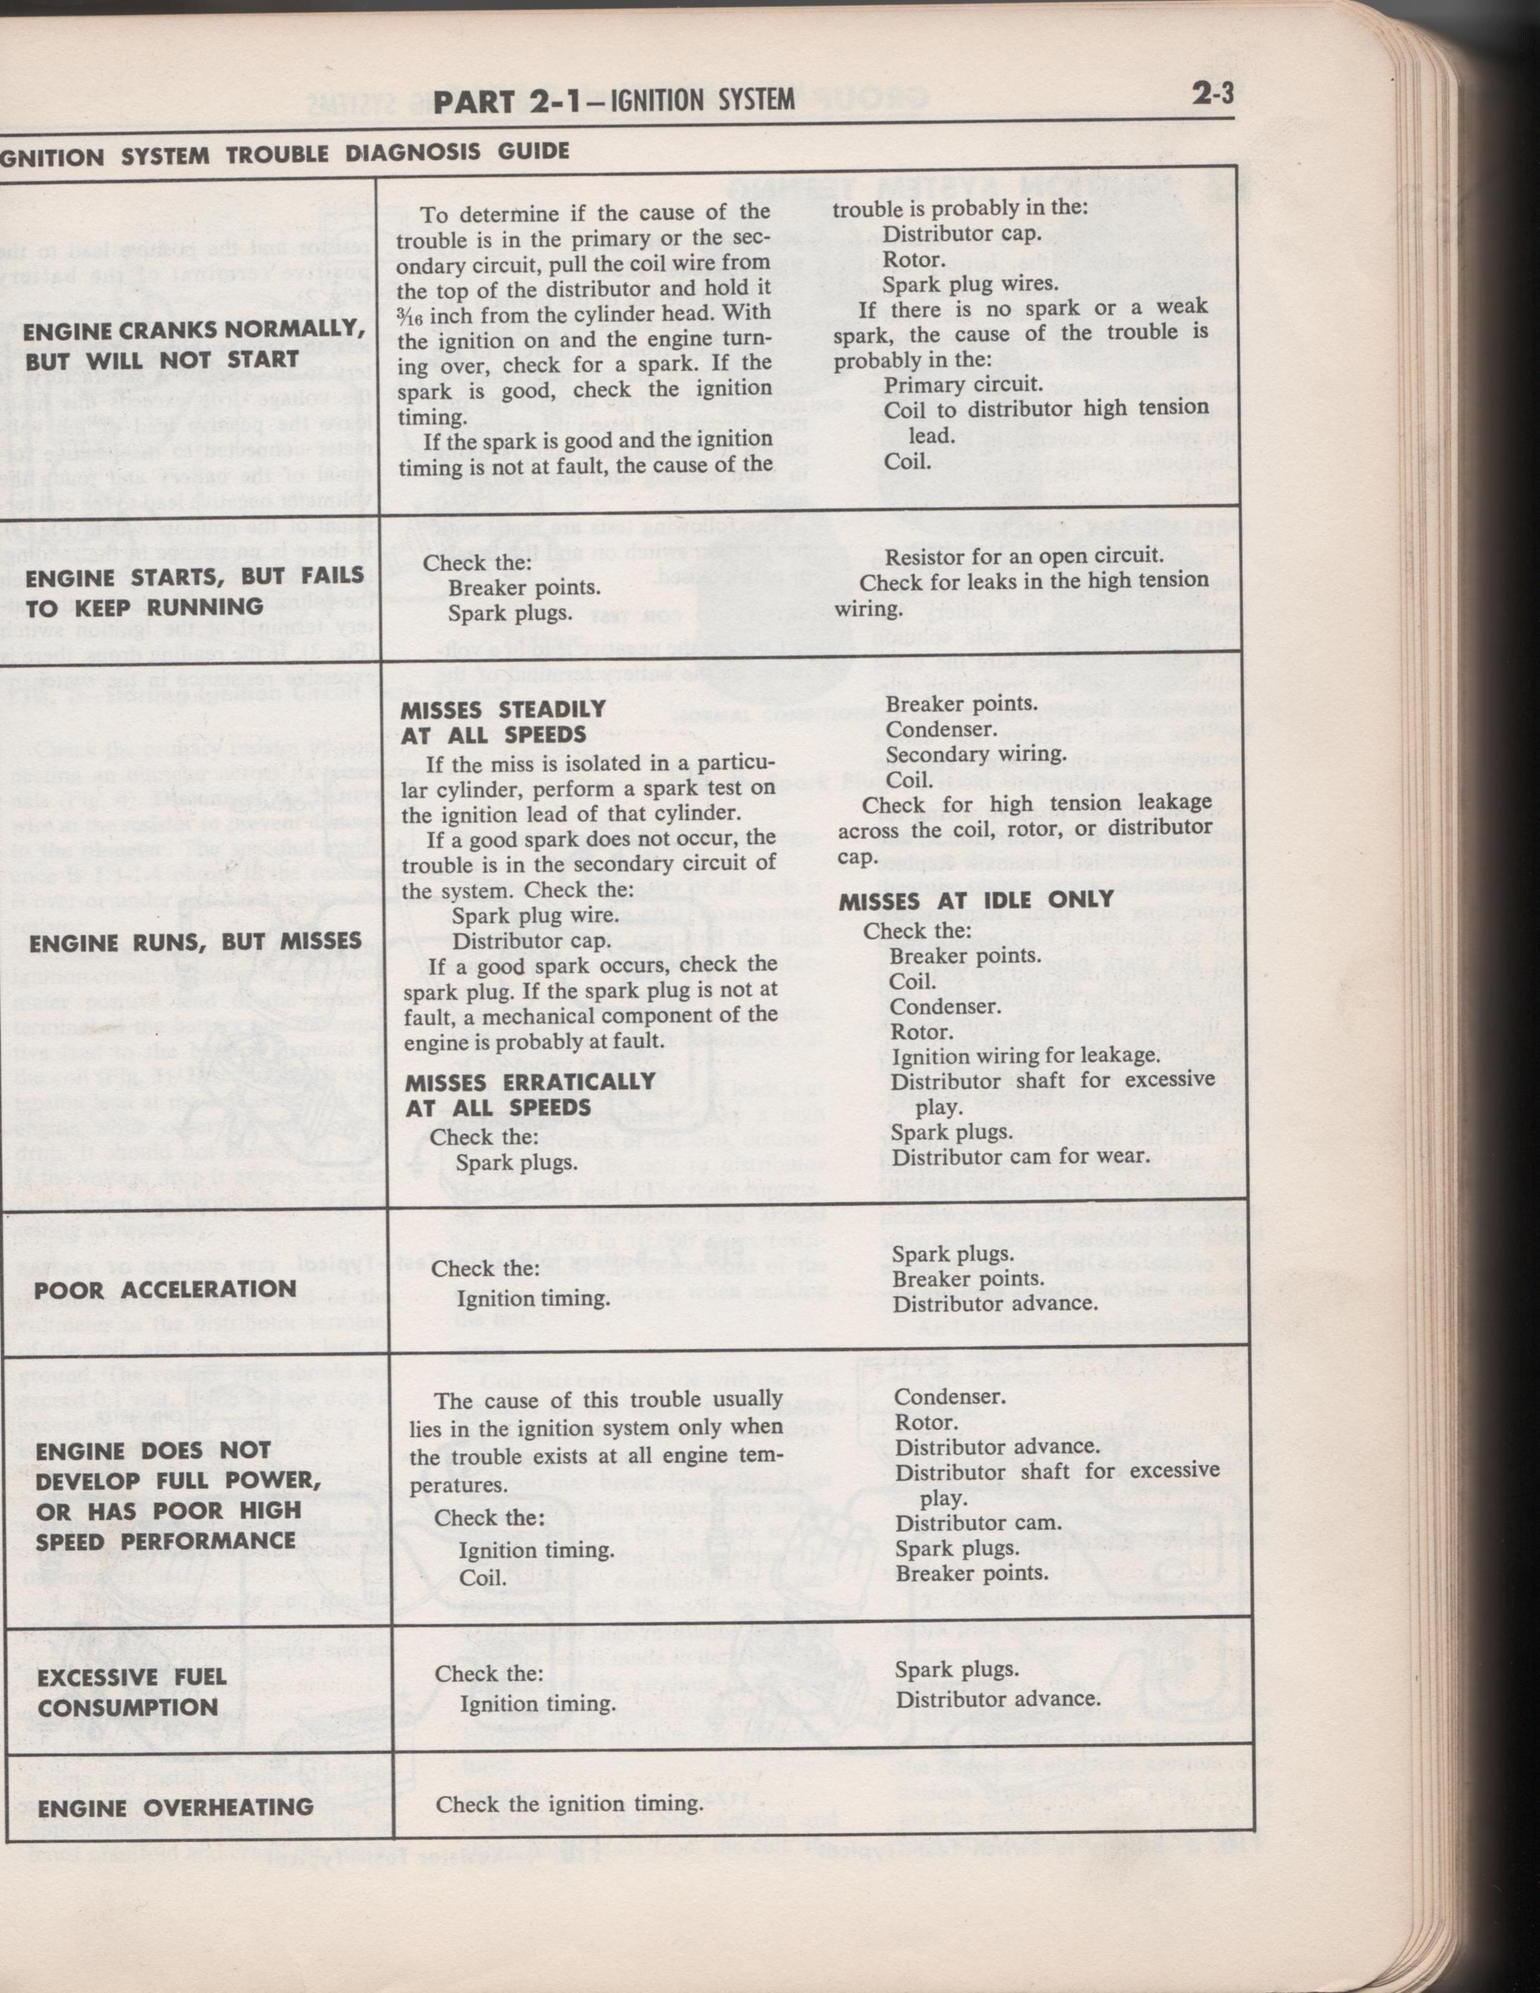 Img A D E Ef Efc E Ede B B D C Cc on 1961 Ford F100 Wiring Diagram For Color